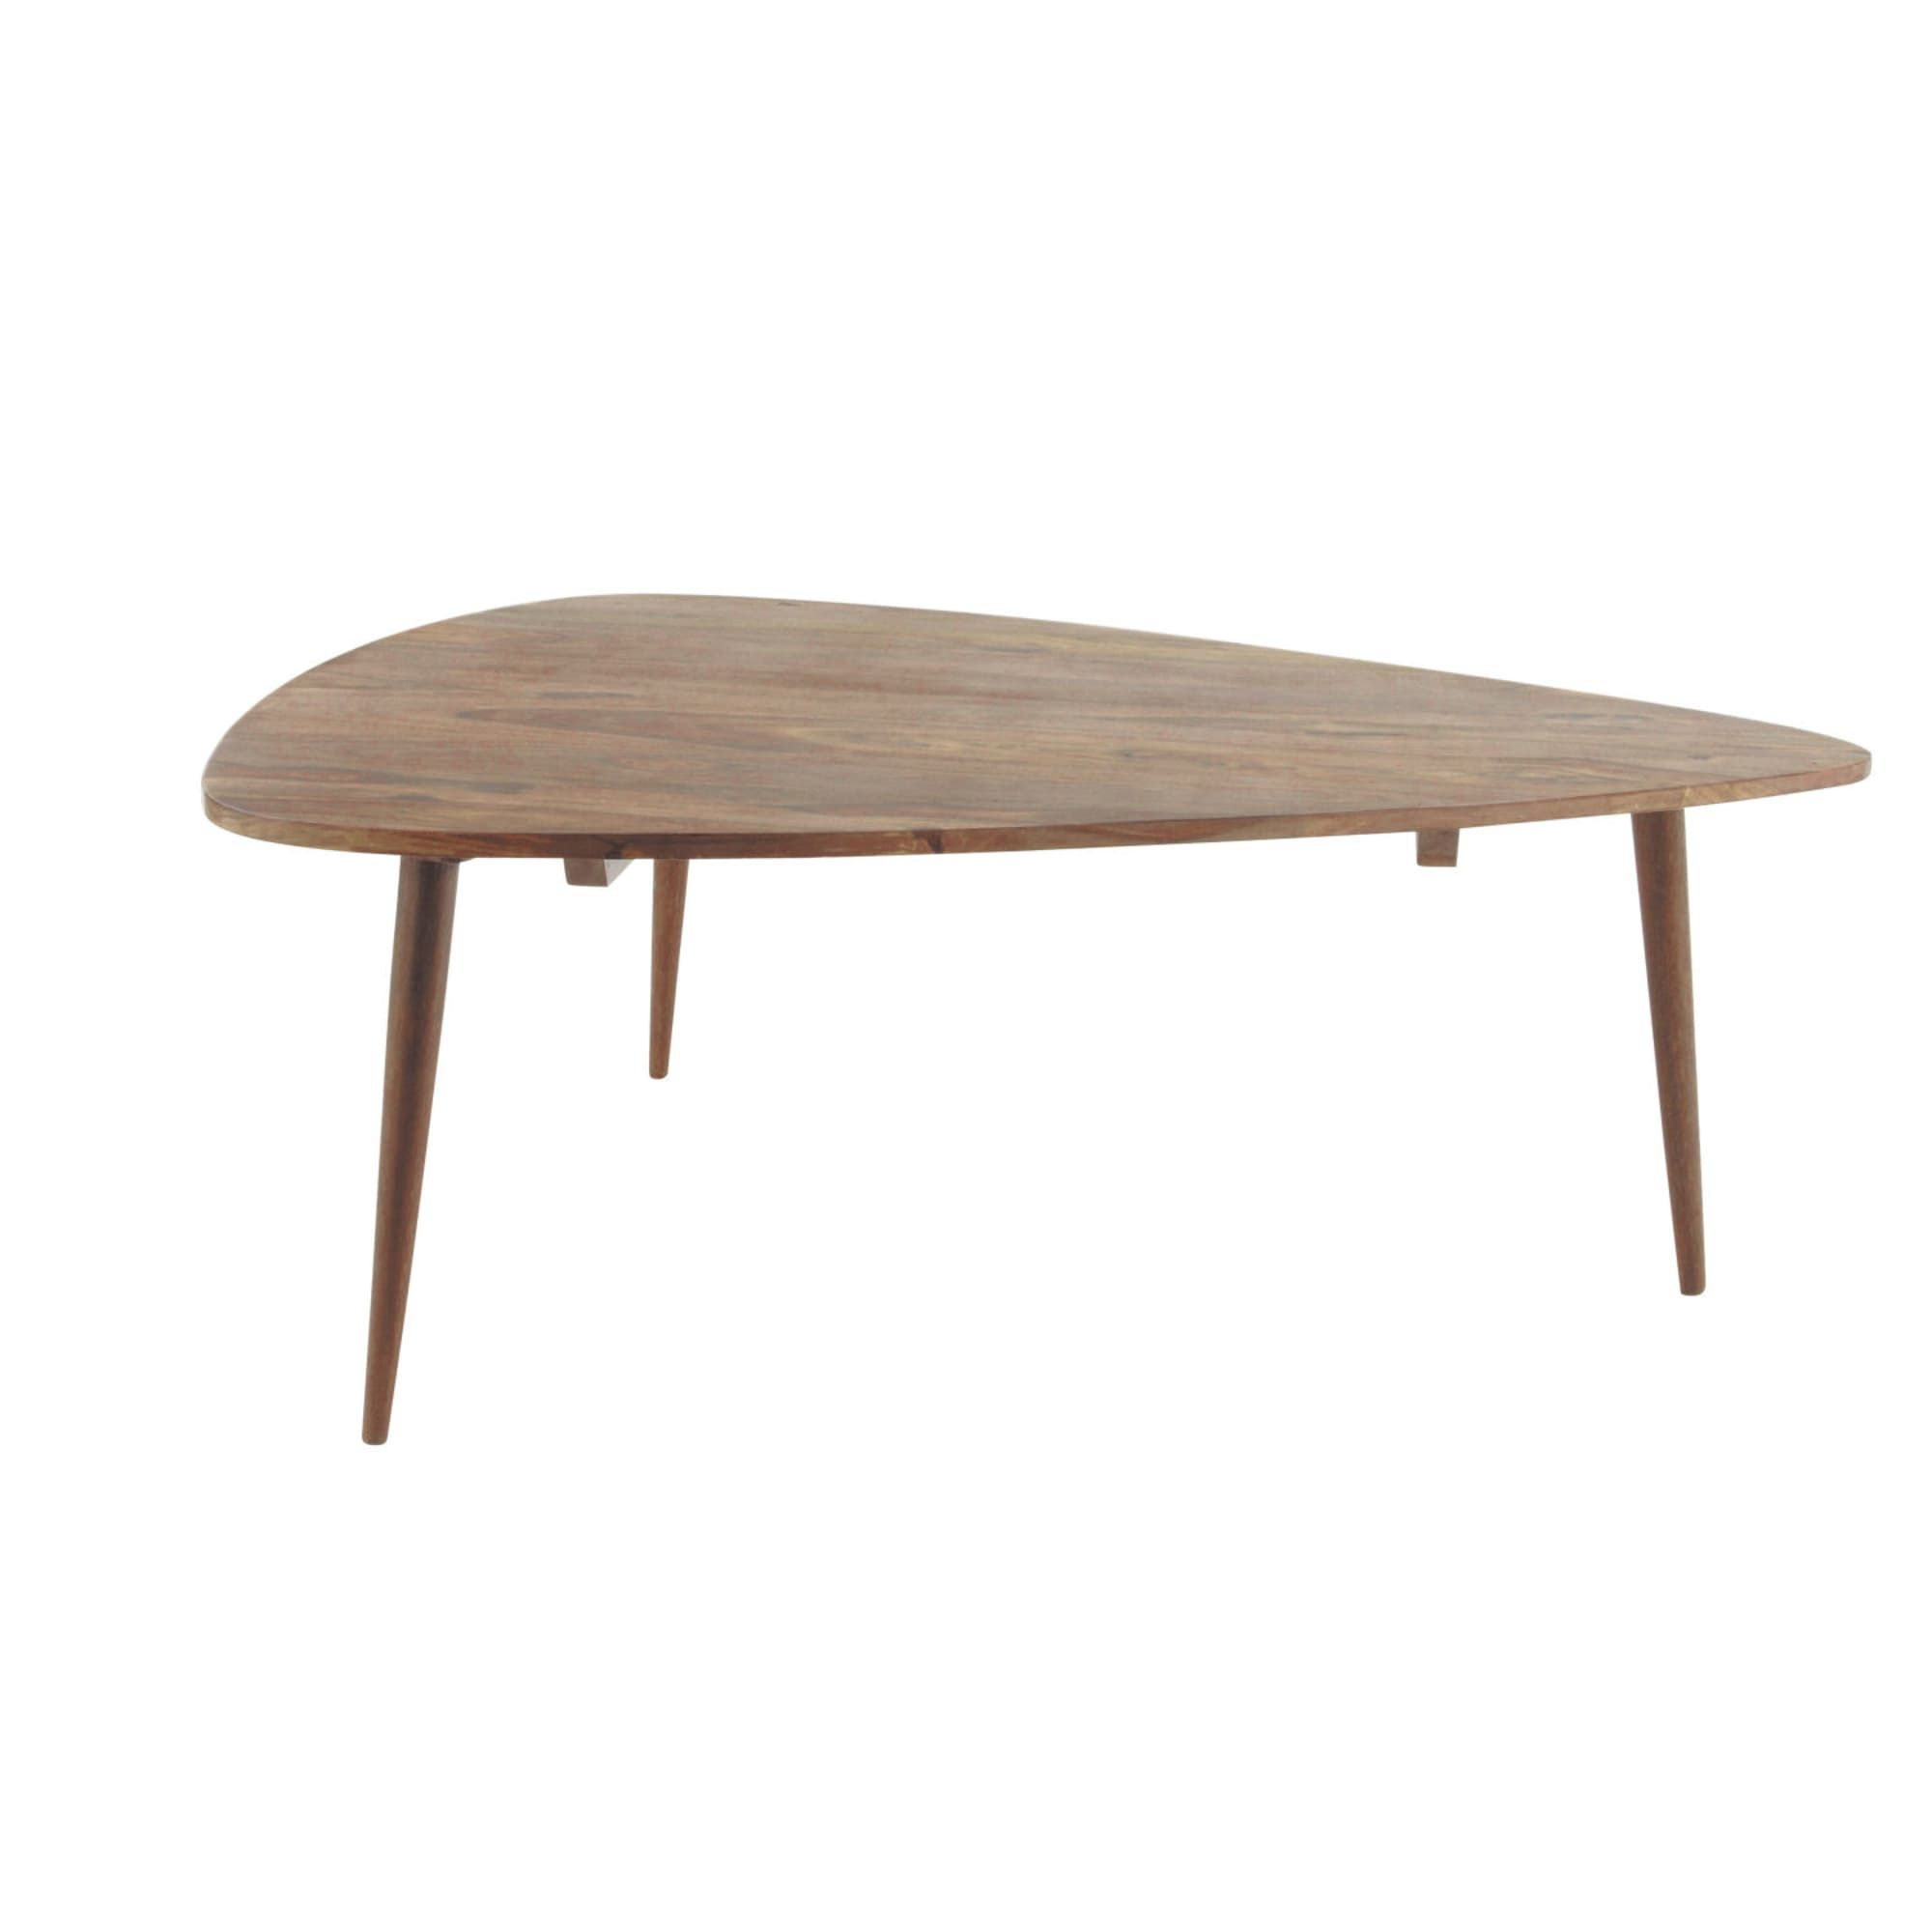 Solid Sheesham Wood Vintage Coffee Table Andersen Table Basse Vintage Table Basse Bas Vintage